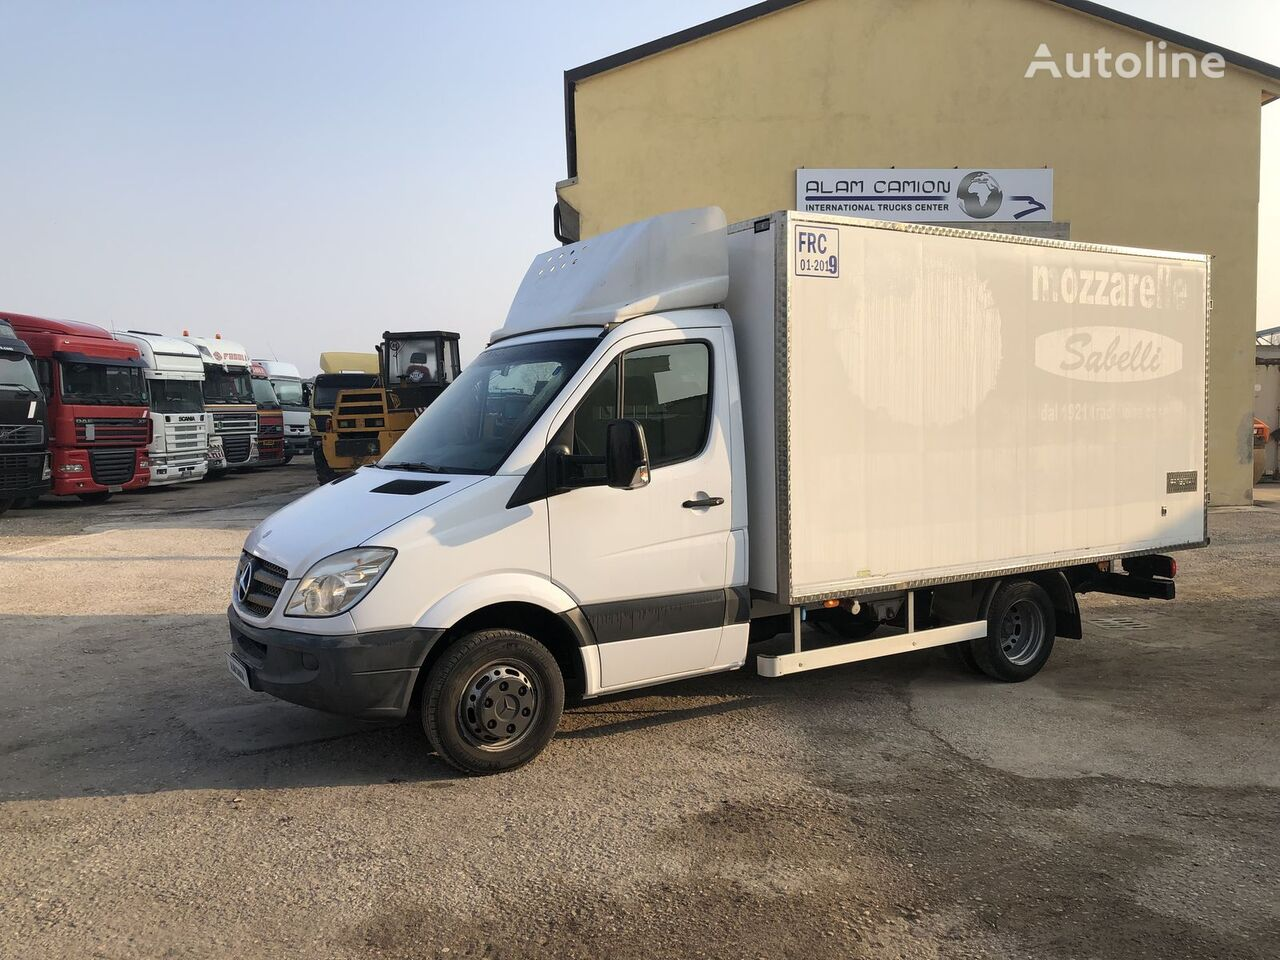 MERCEDES-BENZ Sprinter 516 kamion hladnjača